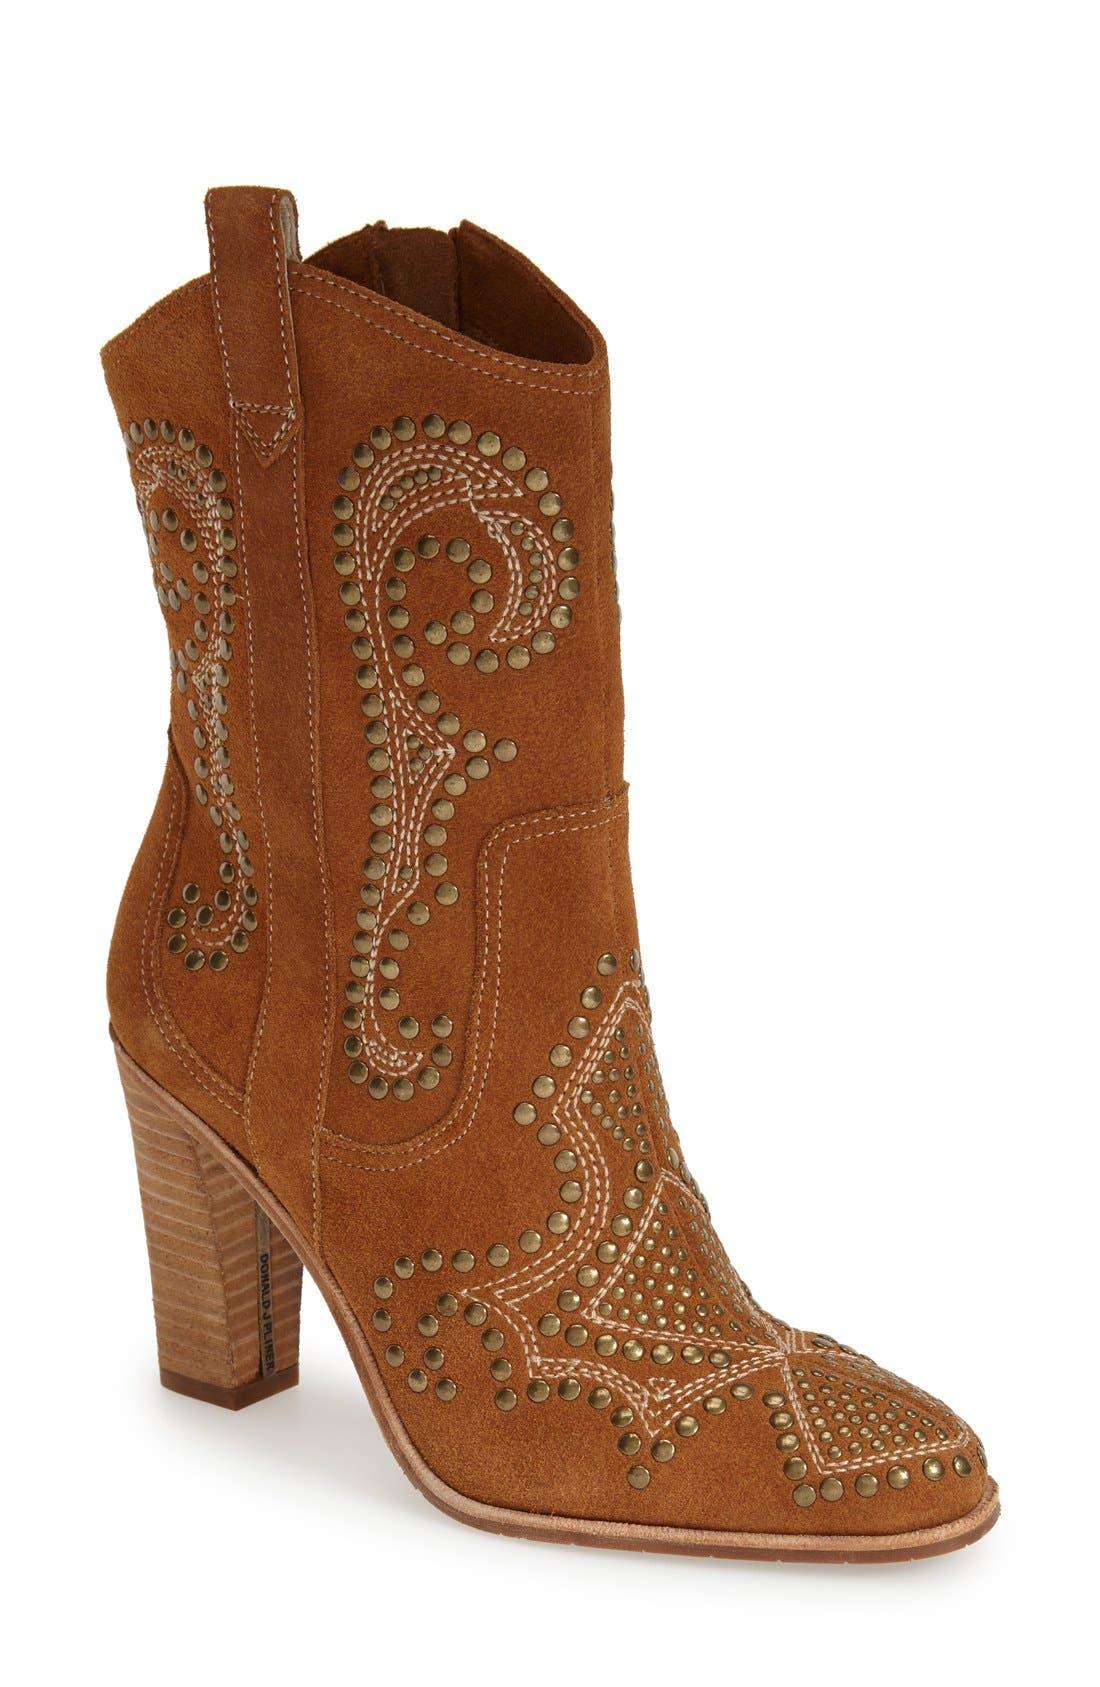 Main Image - Donald J Pliner 'Olivia' Western Boot (Women)